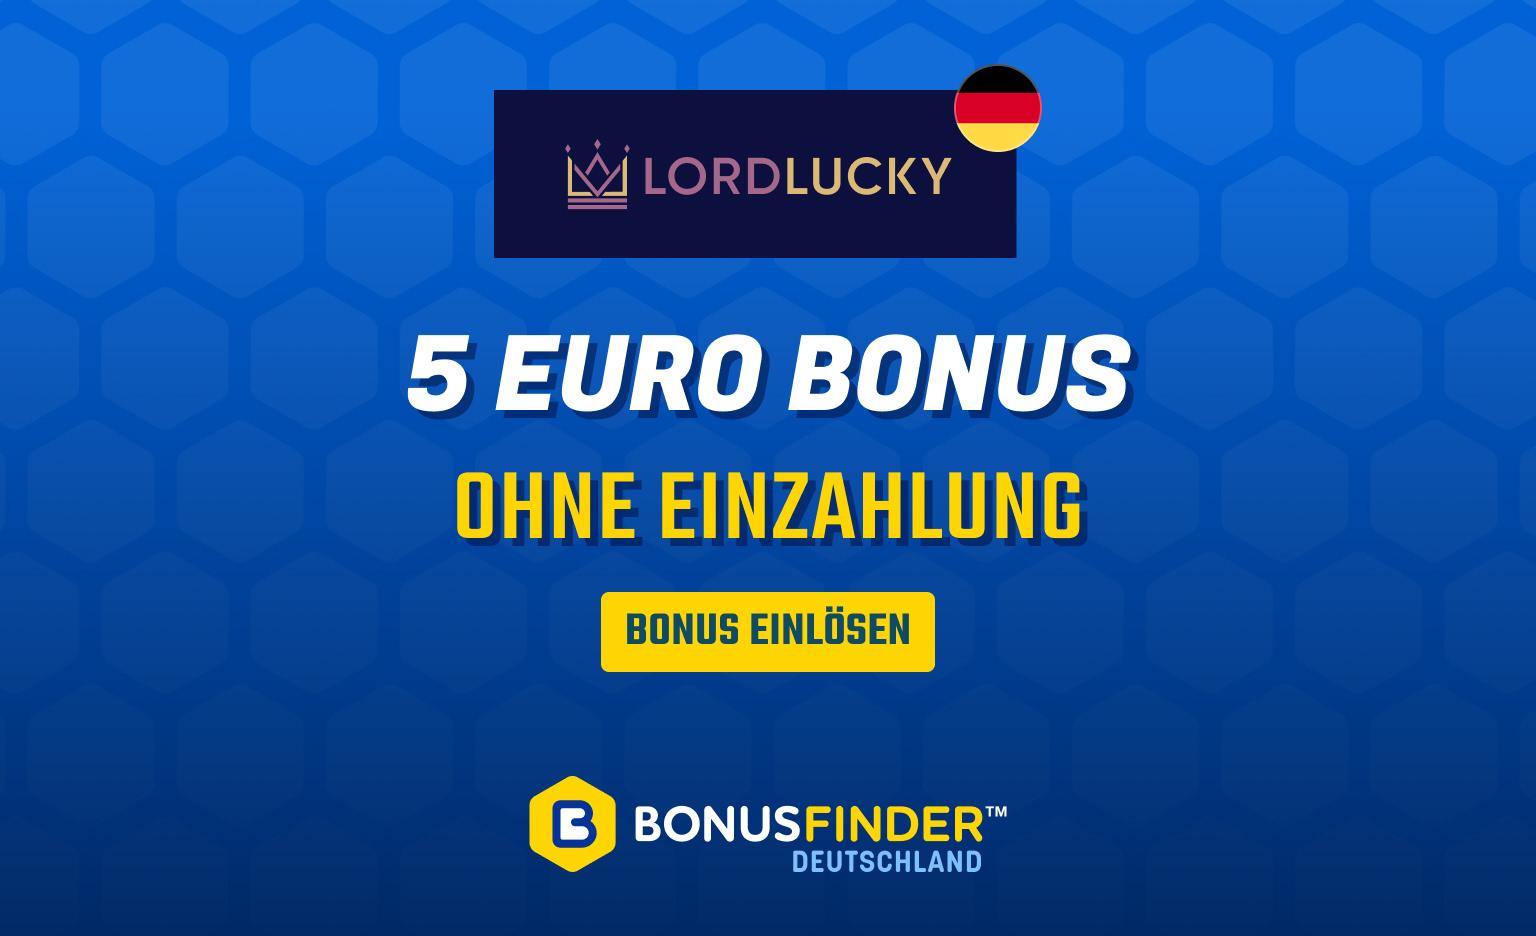 lord lucky bonus ohne einzahlung